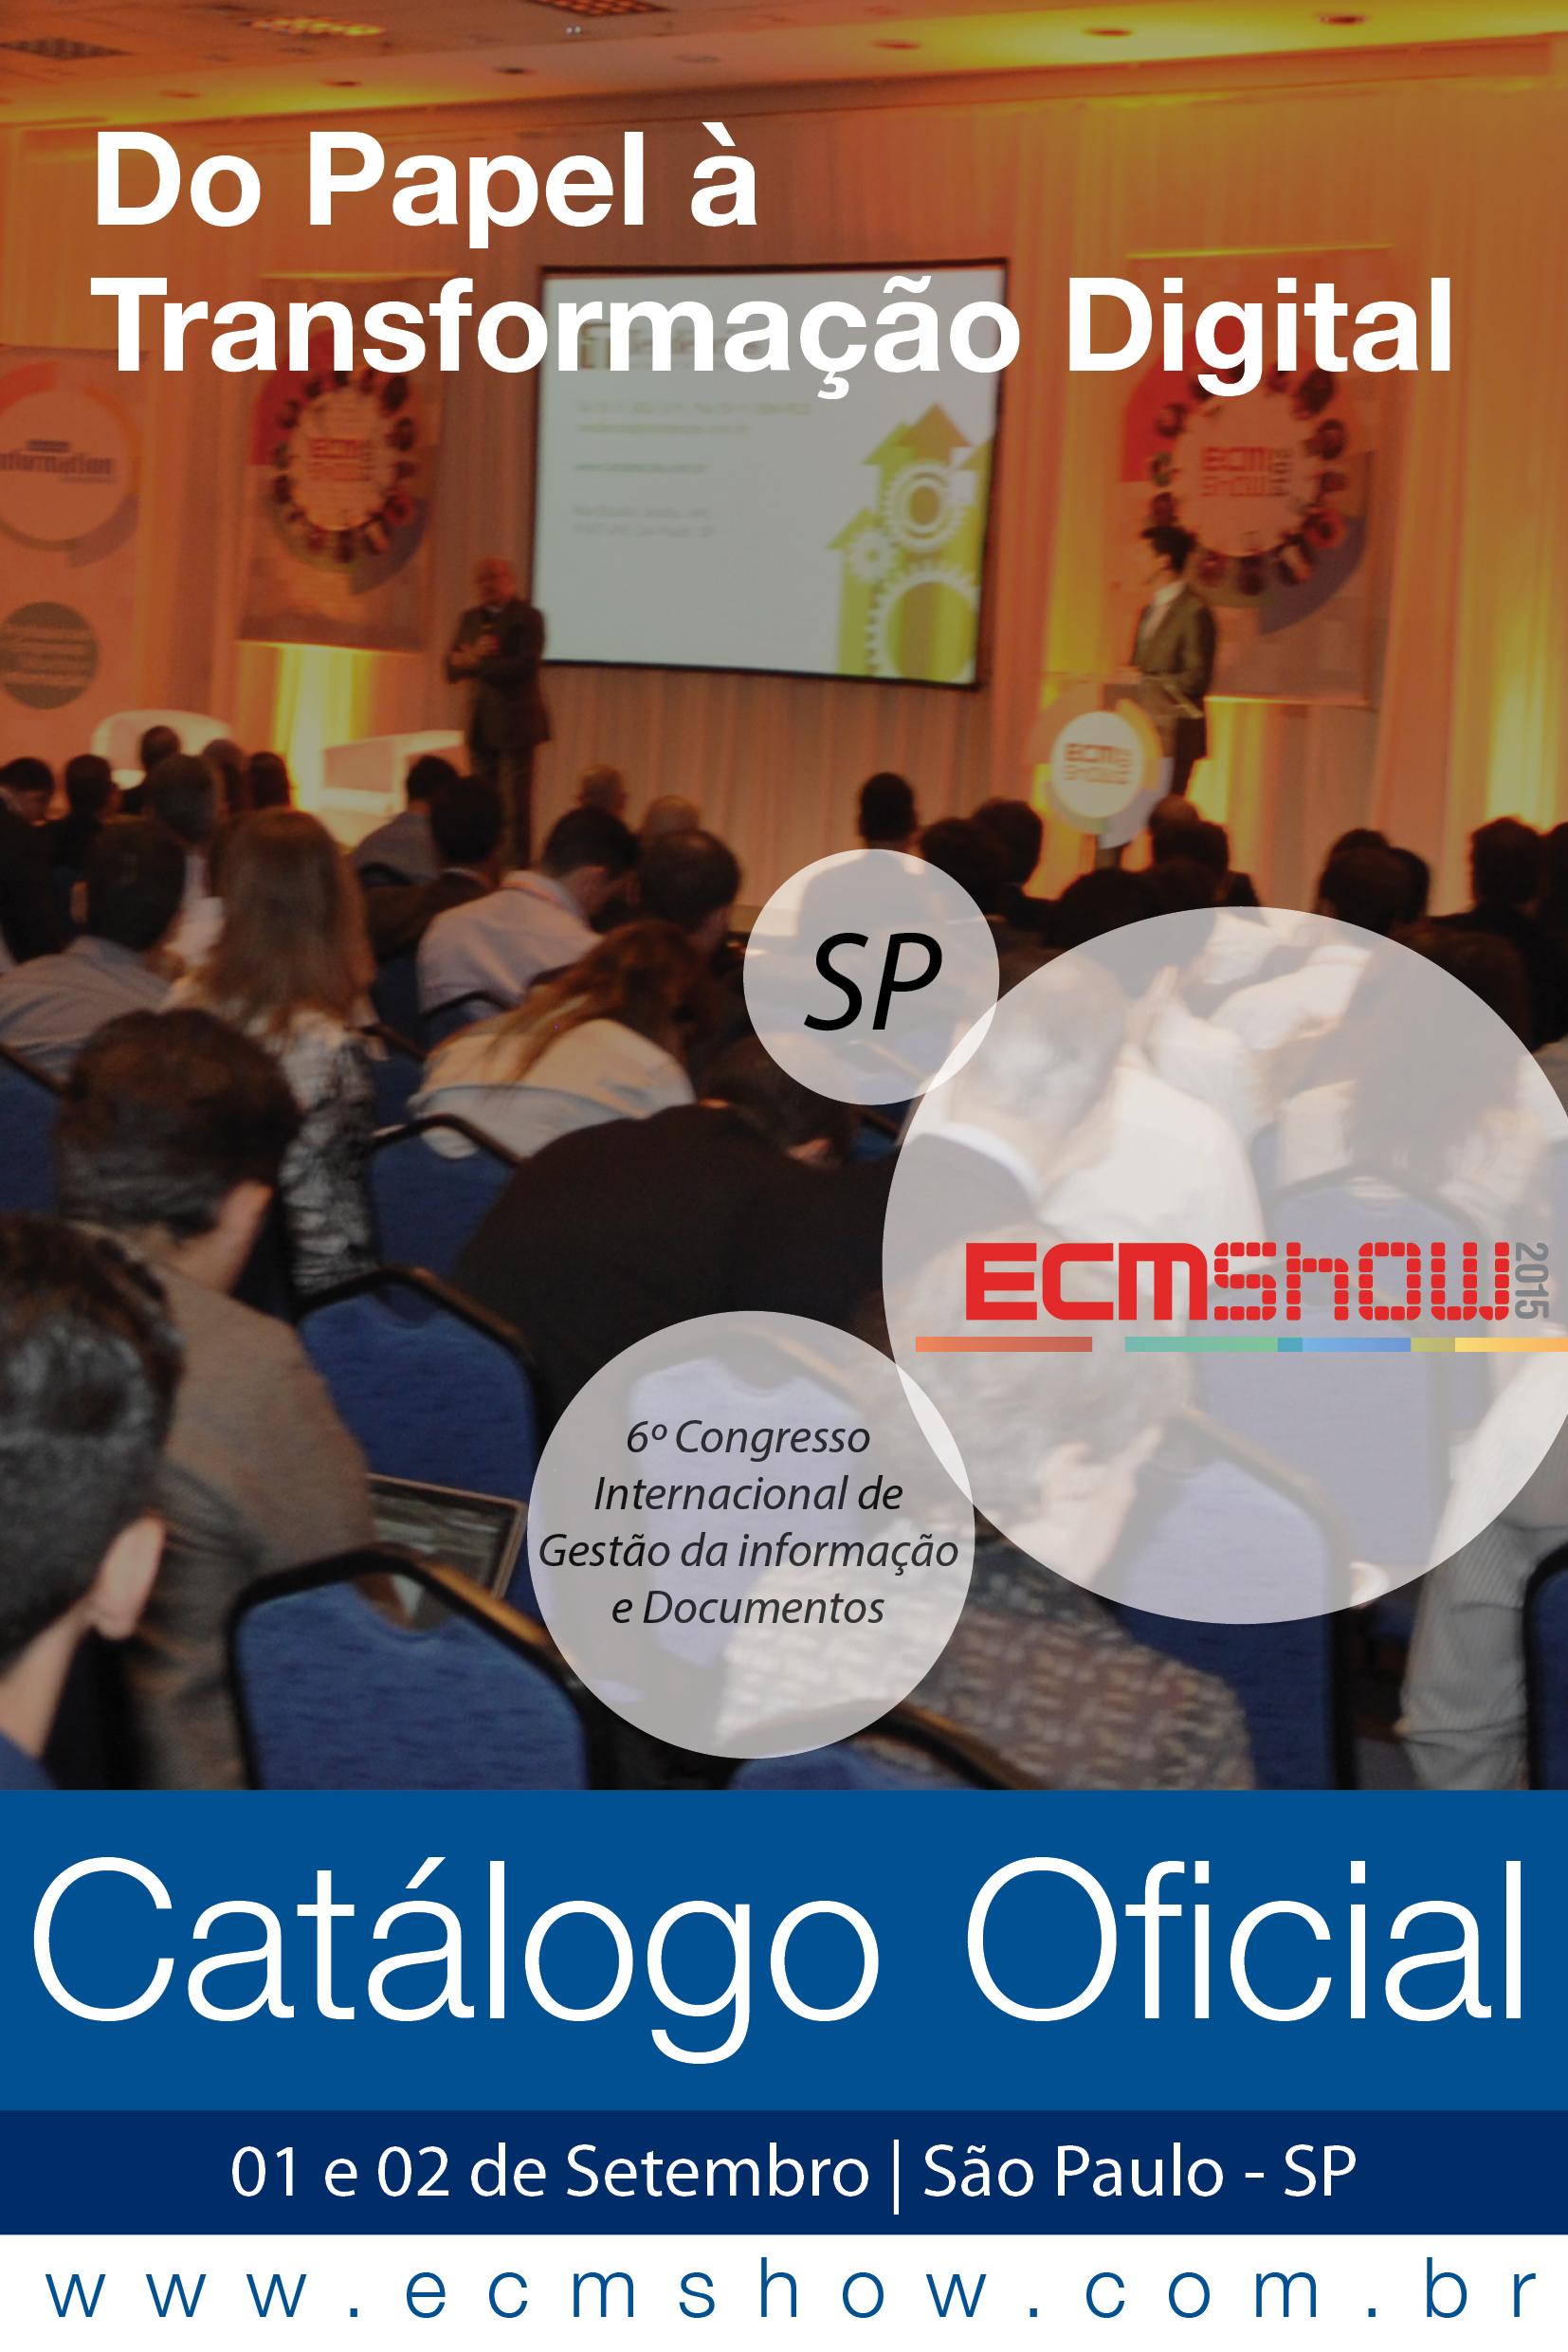 ECM SHOW 2015